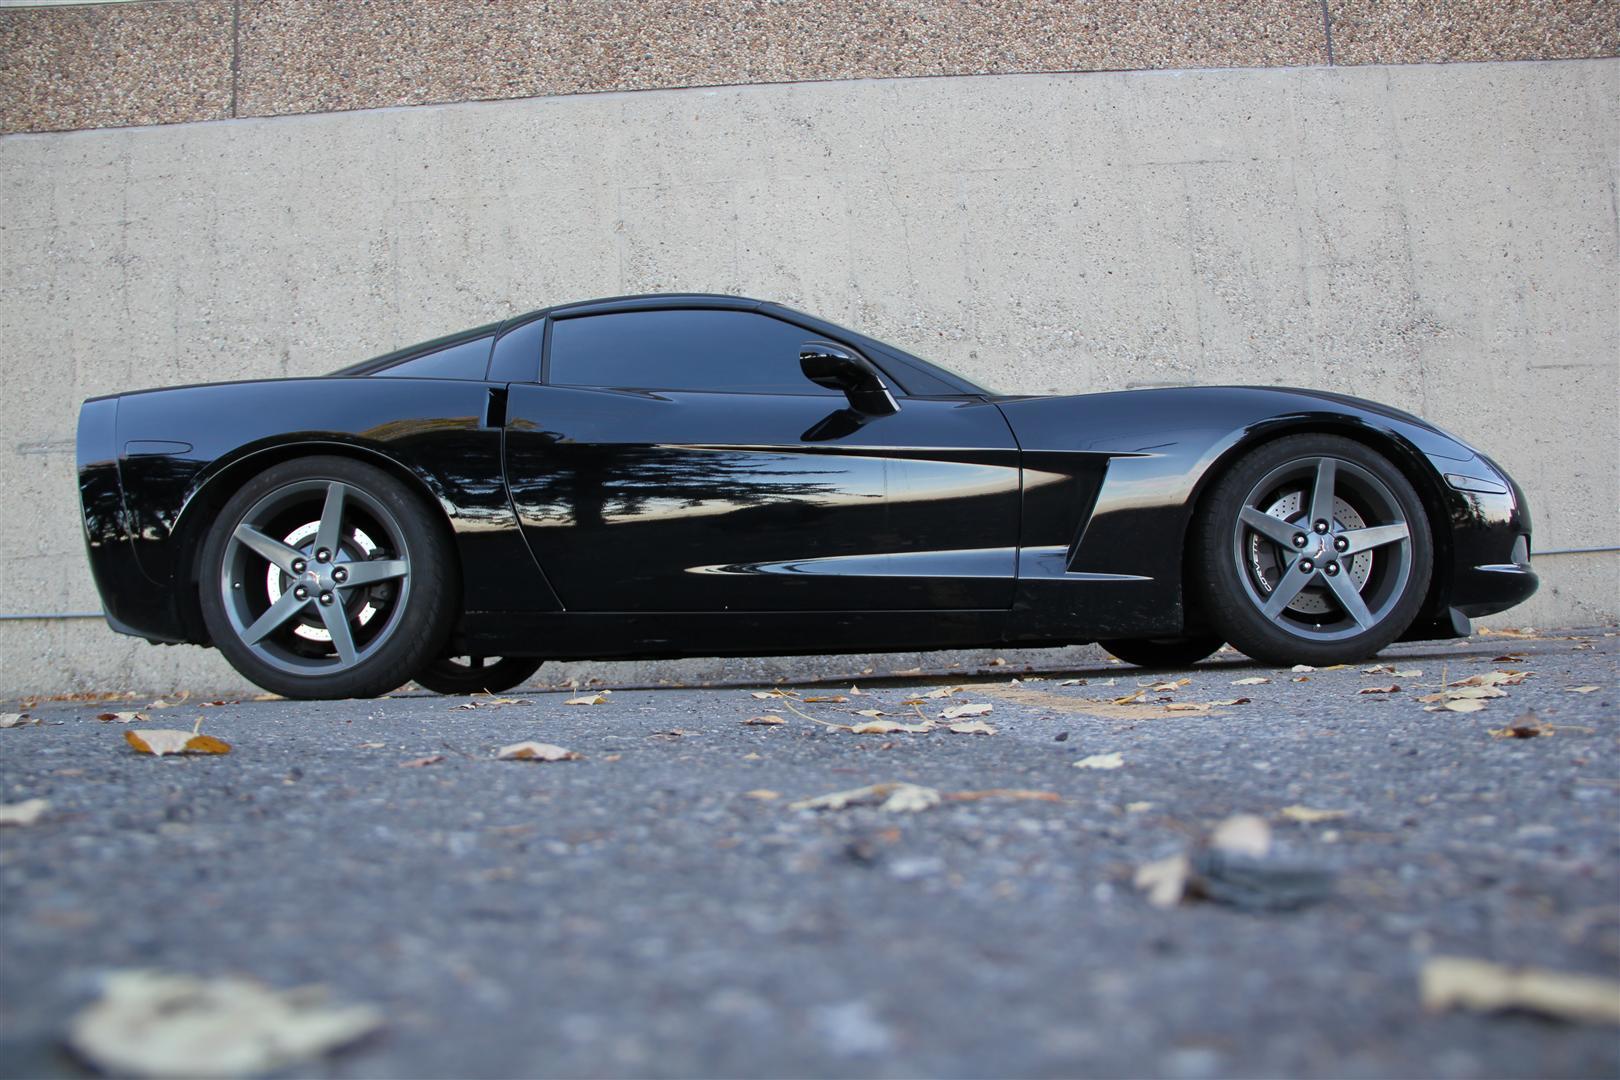 2007 Chevrolet Corvette C6 – 525 RWHP | Envision Auto - Calgary ...